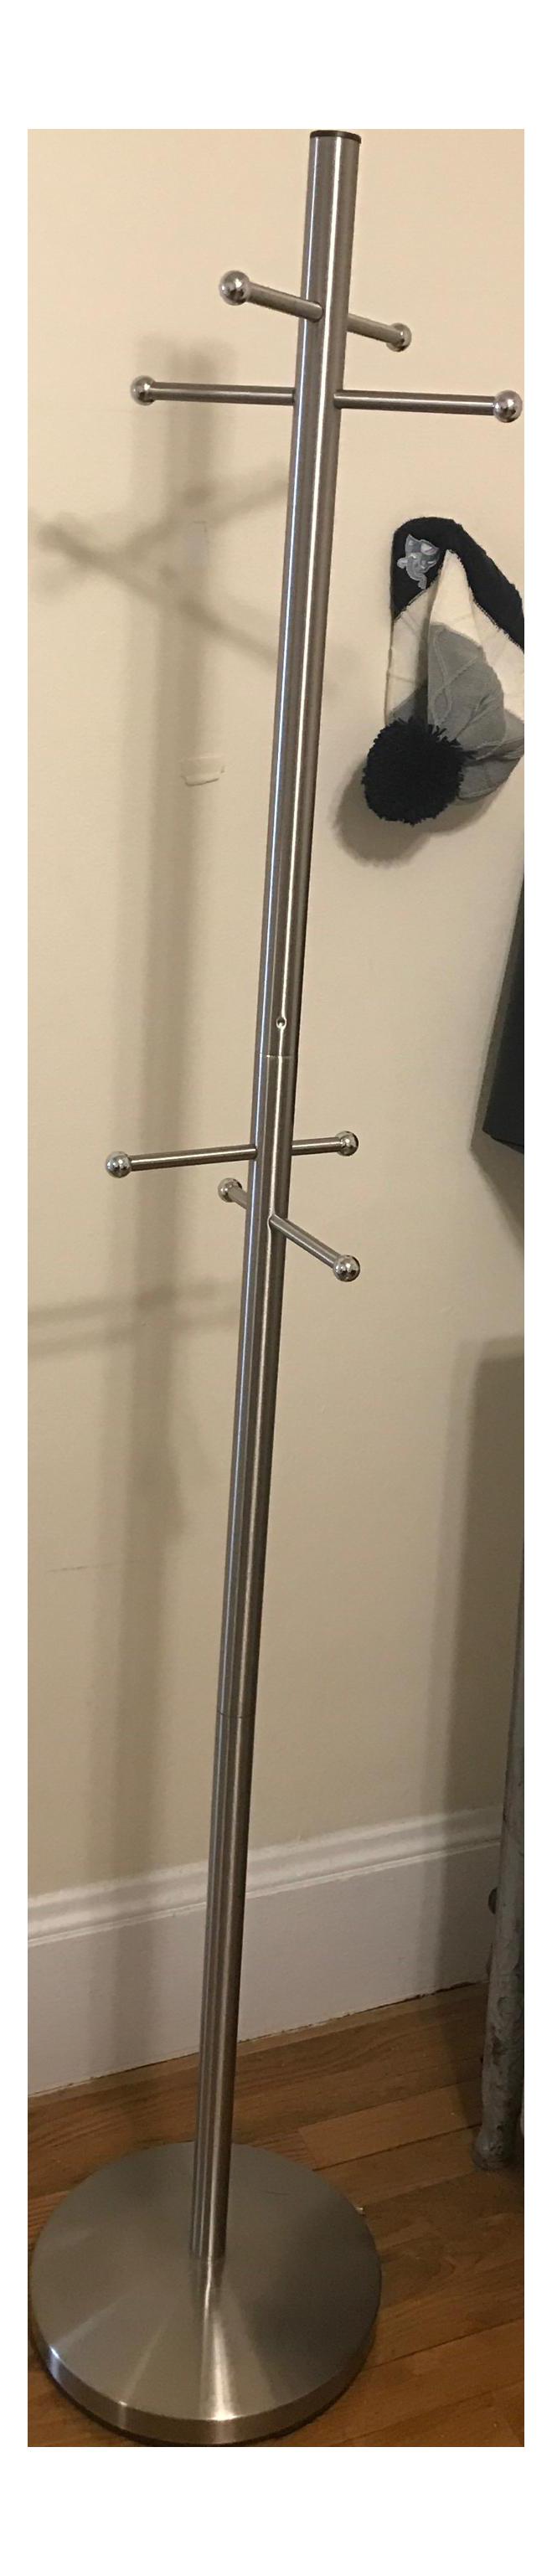 west elm stainless steel coat rack  chairish - image of west elm stainless steel coat rack